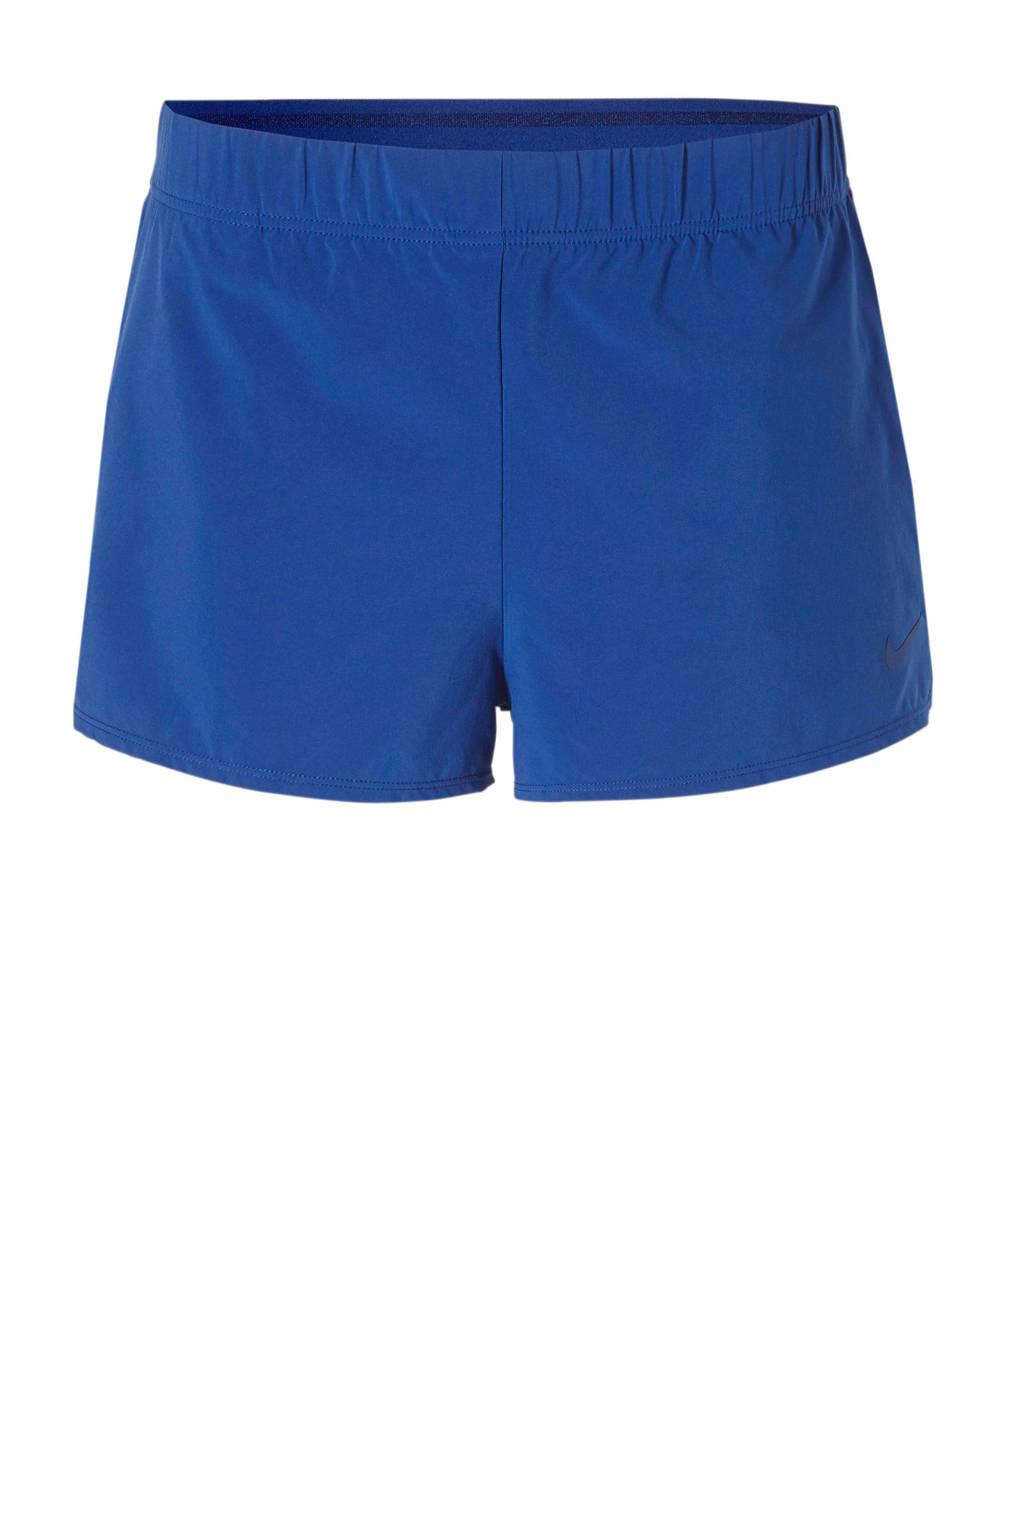 Nike sportshort blauw, Blauw